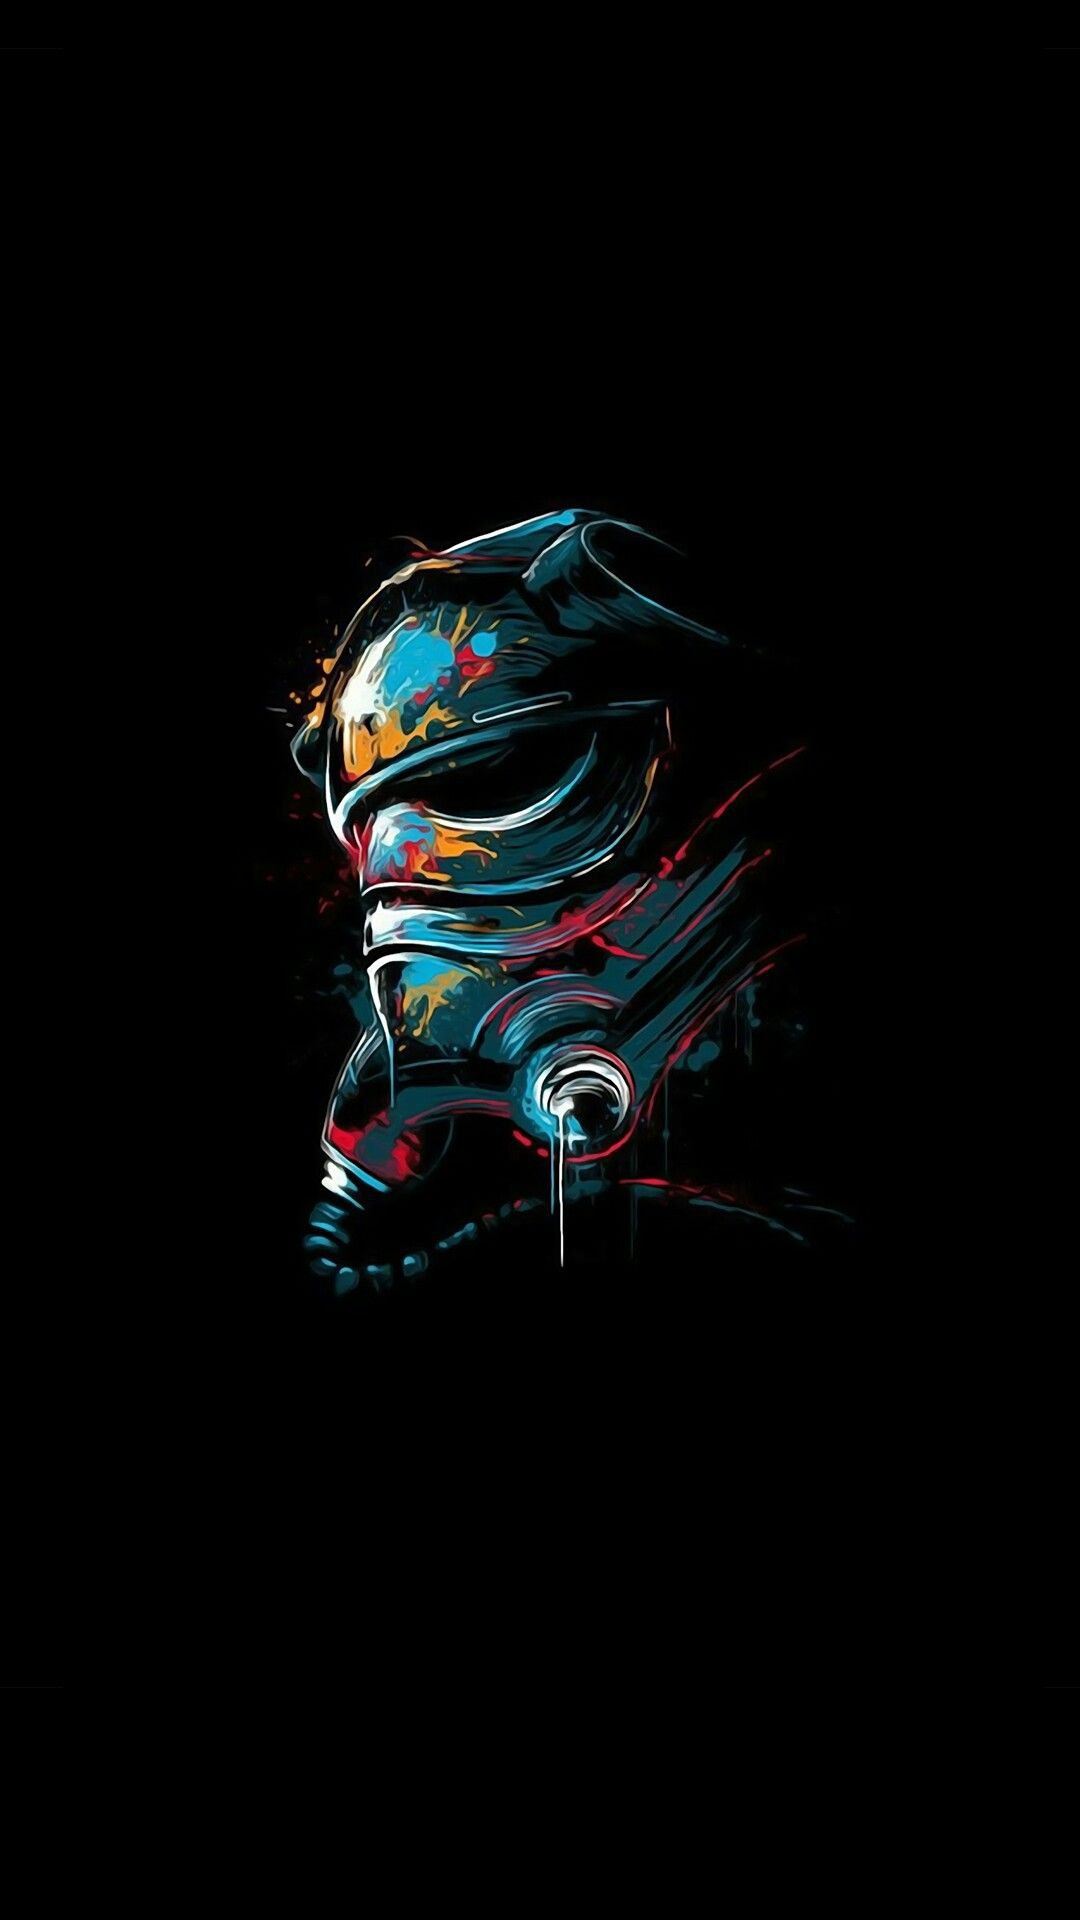 Star Wars Soldier Mask iPhone Wallpaper iphoneswallpapers com